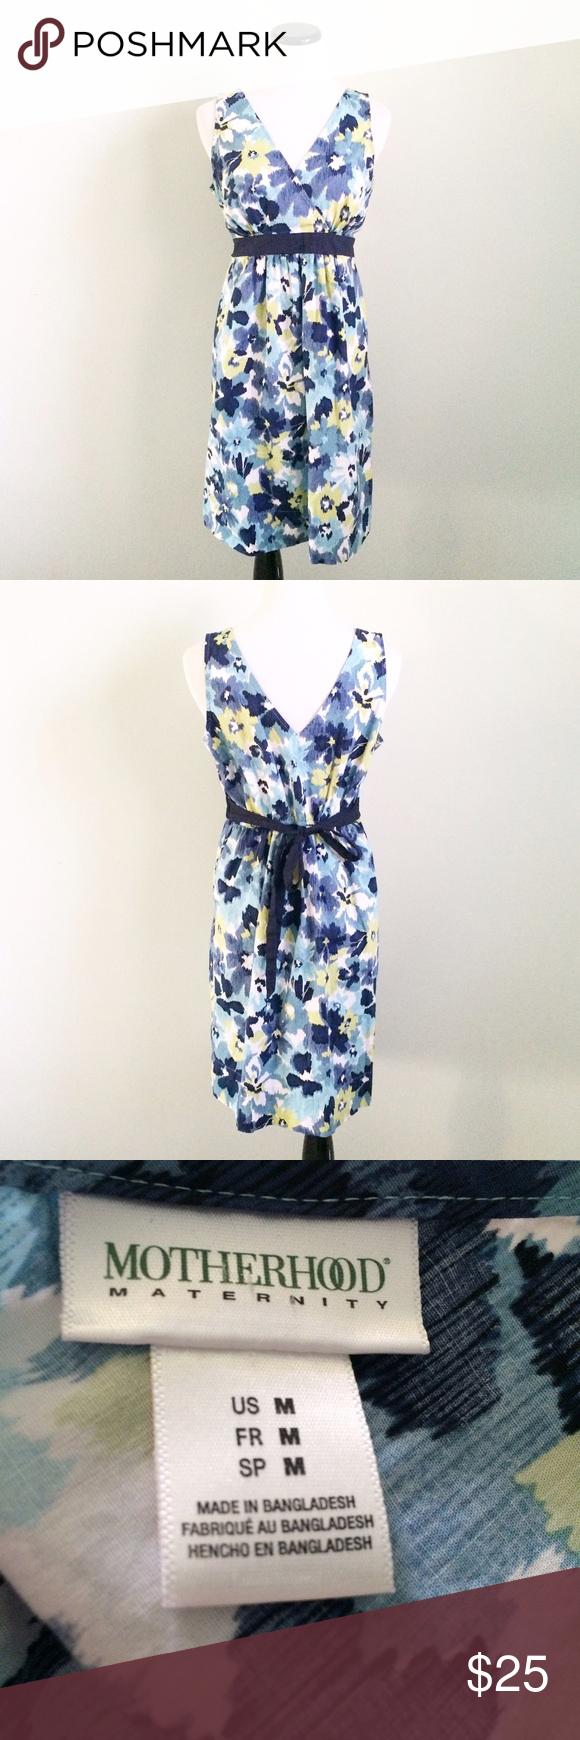 Motherhood maternity blue floral sleeveless dress gently worn and